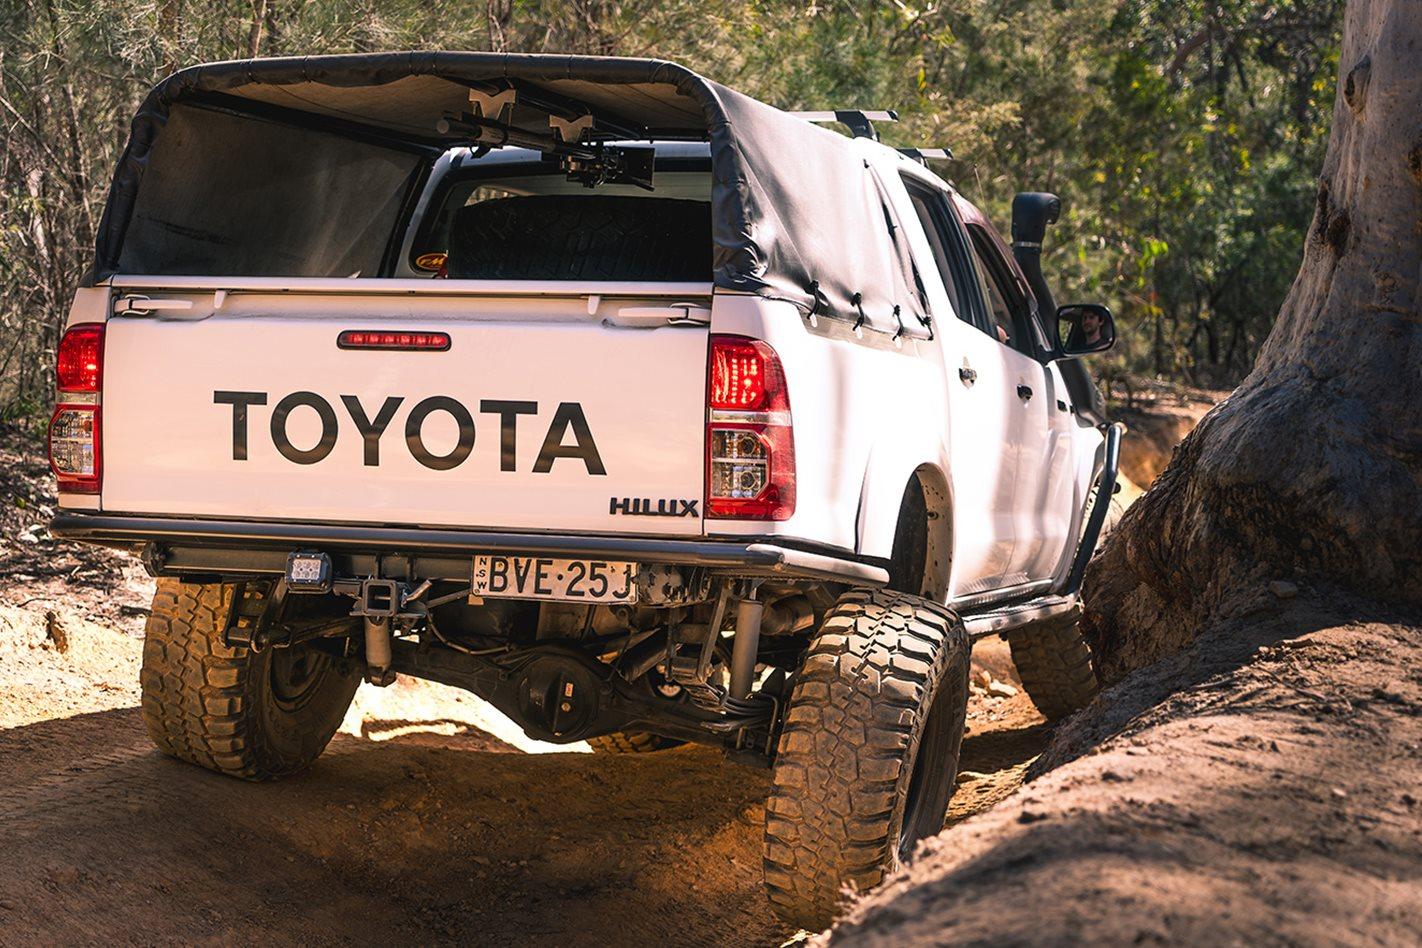 2015-Toyota-Hilux-rear-on.jpg